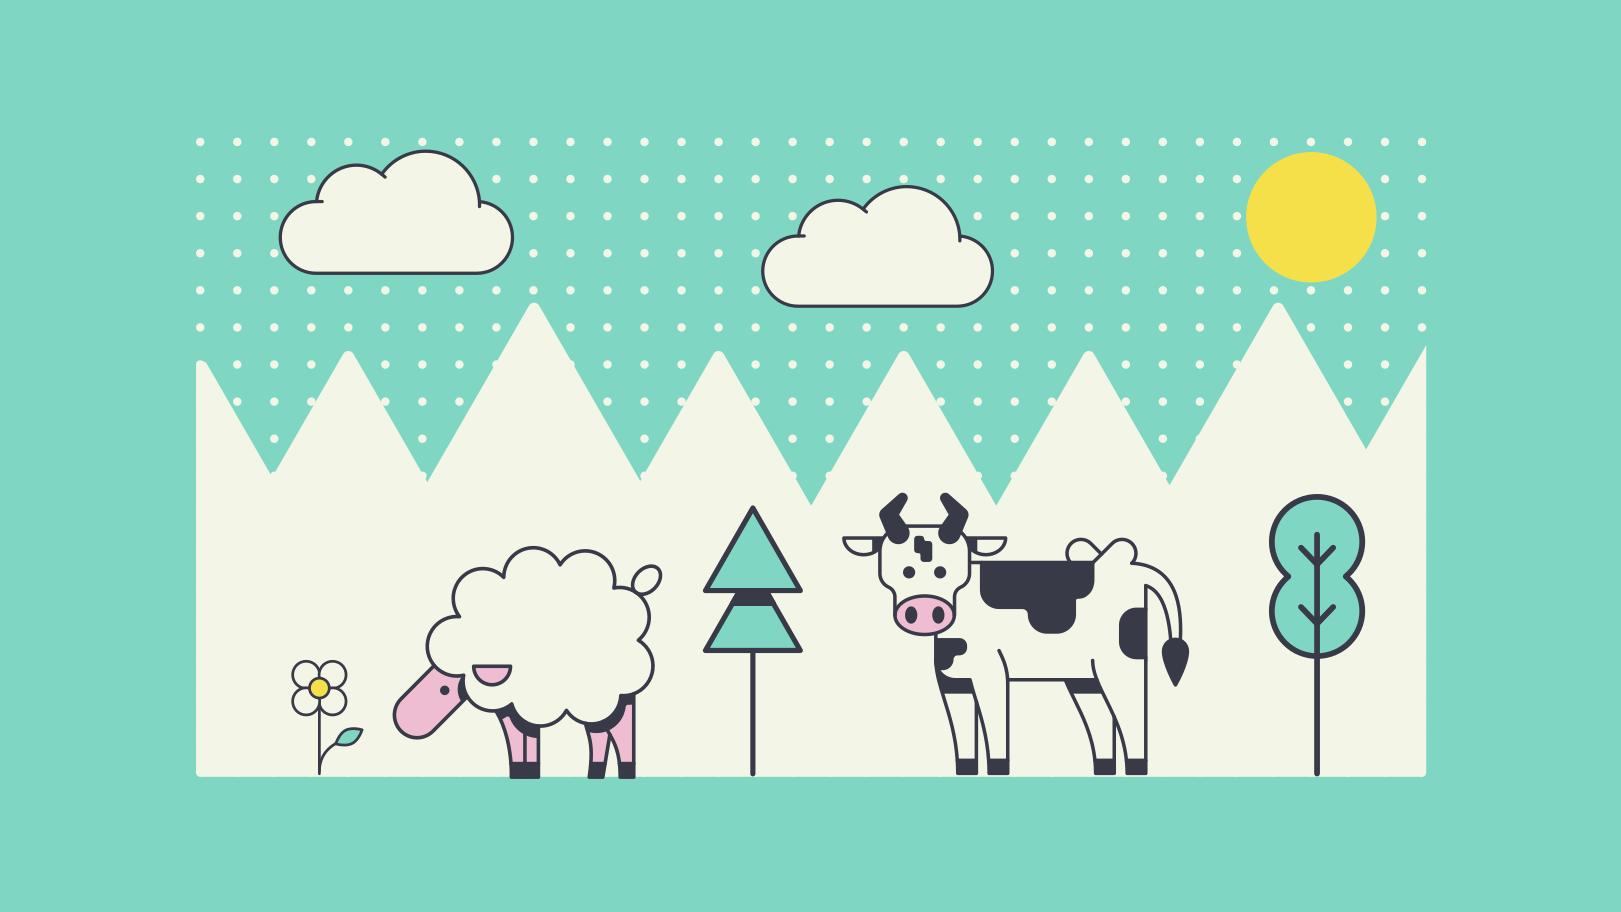 Pasture Clipart illustration in PNG, SVG